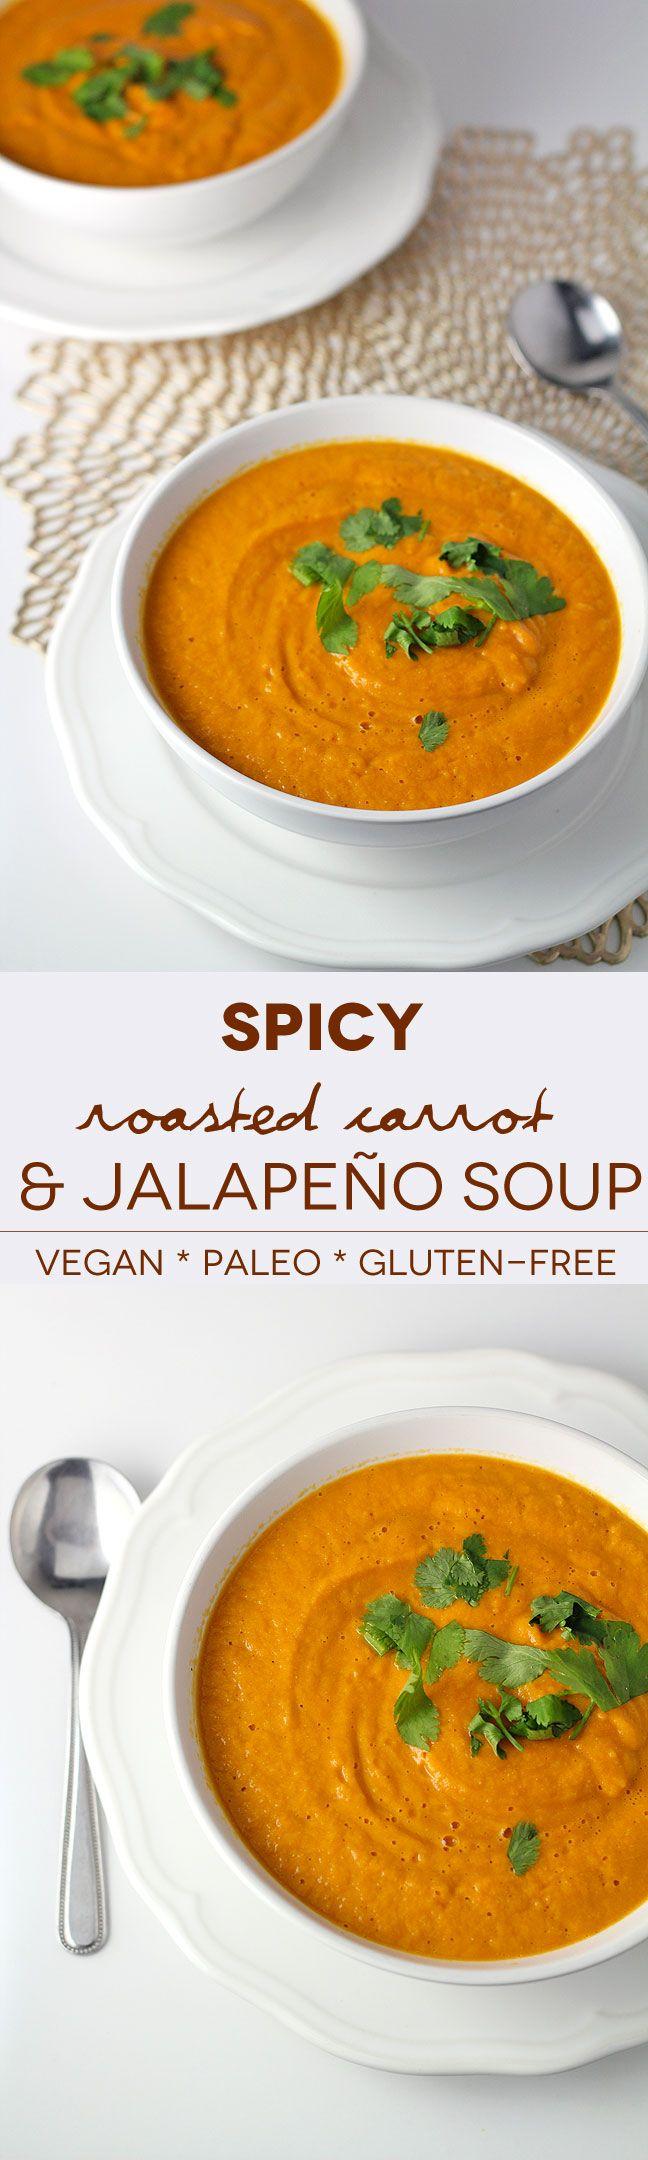 Spicy Roasted Carrot and Jalapeño Soup #vegan #paleo #glutenfree